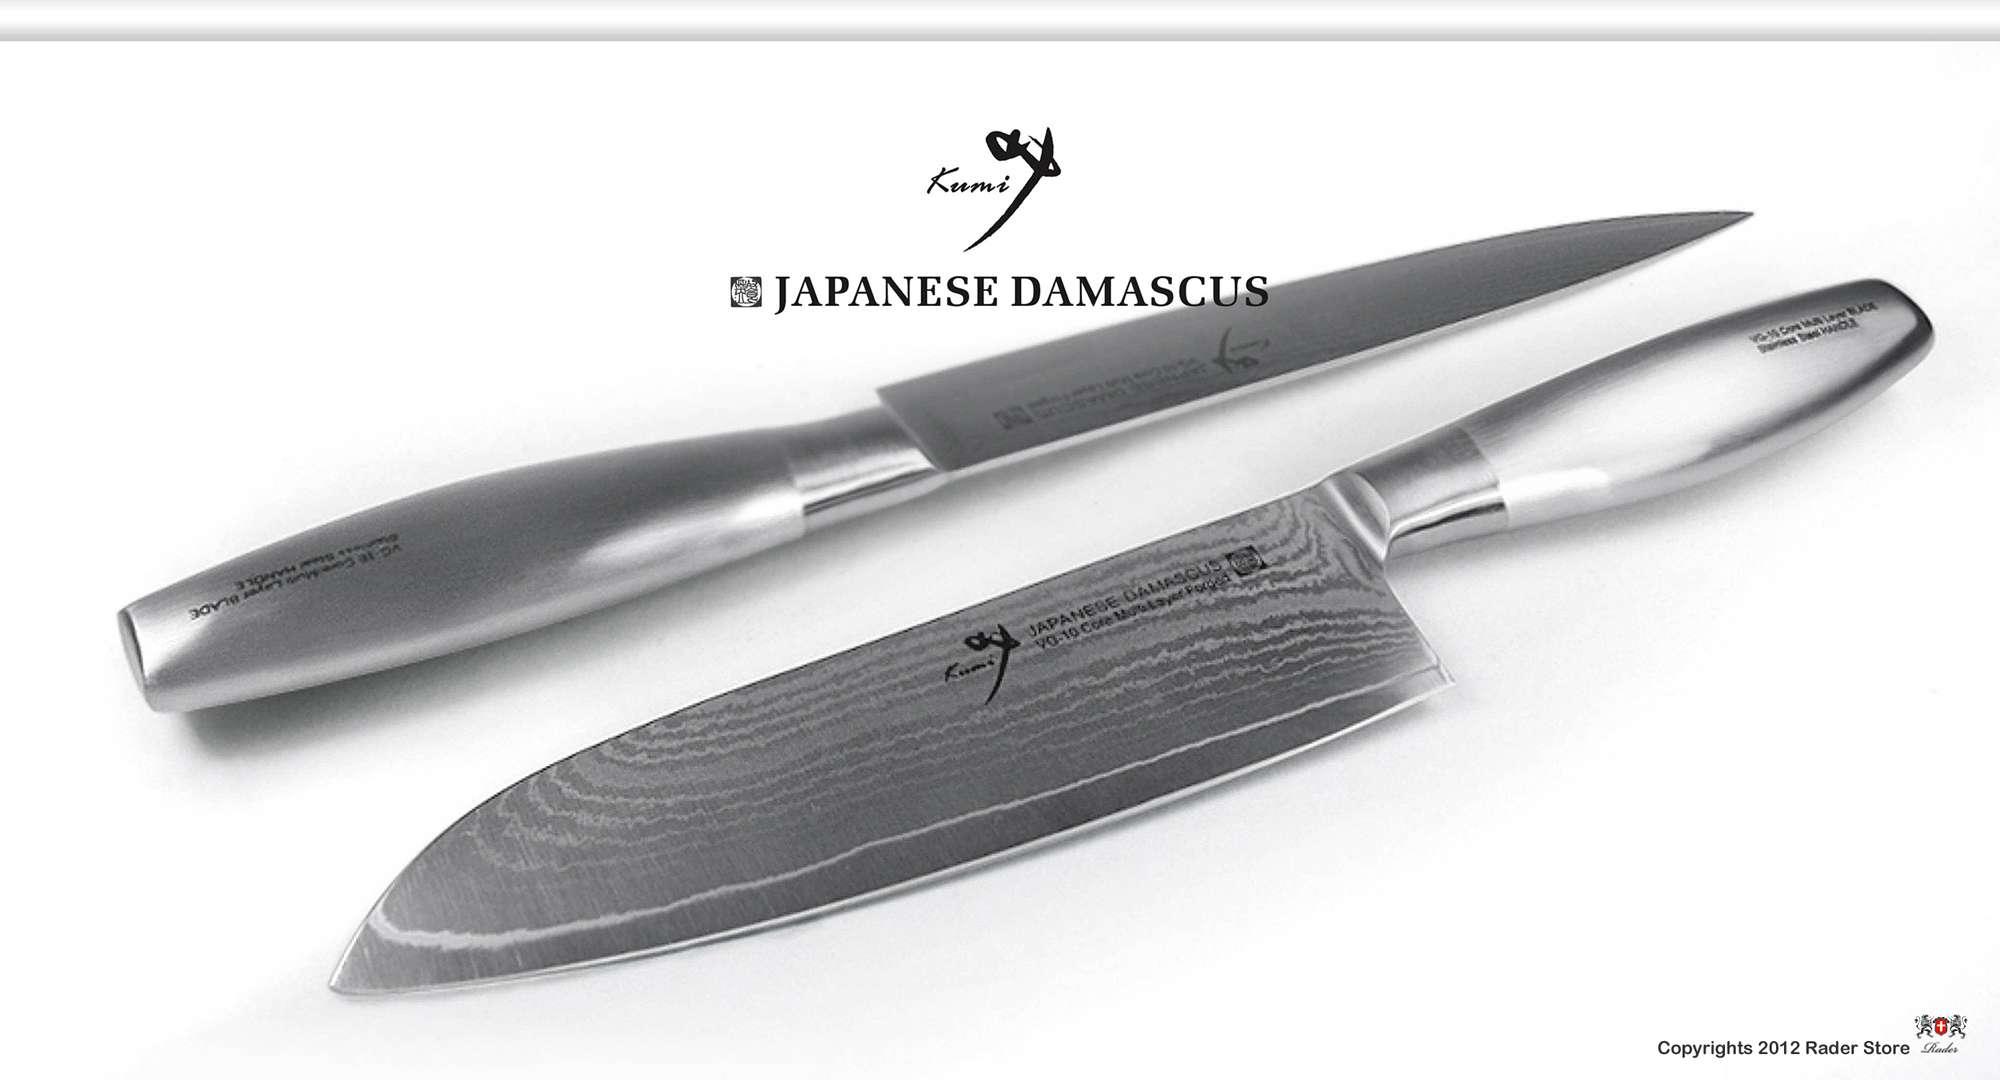 items in rader kitchen knife store on ebay professional kitchen knives set professional kitchen